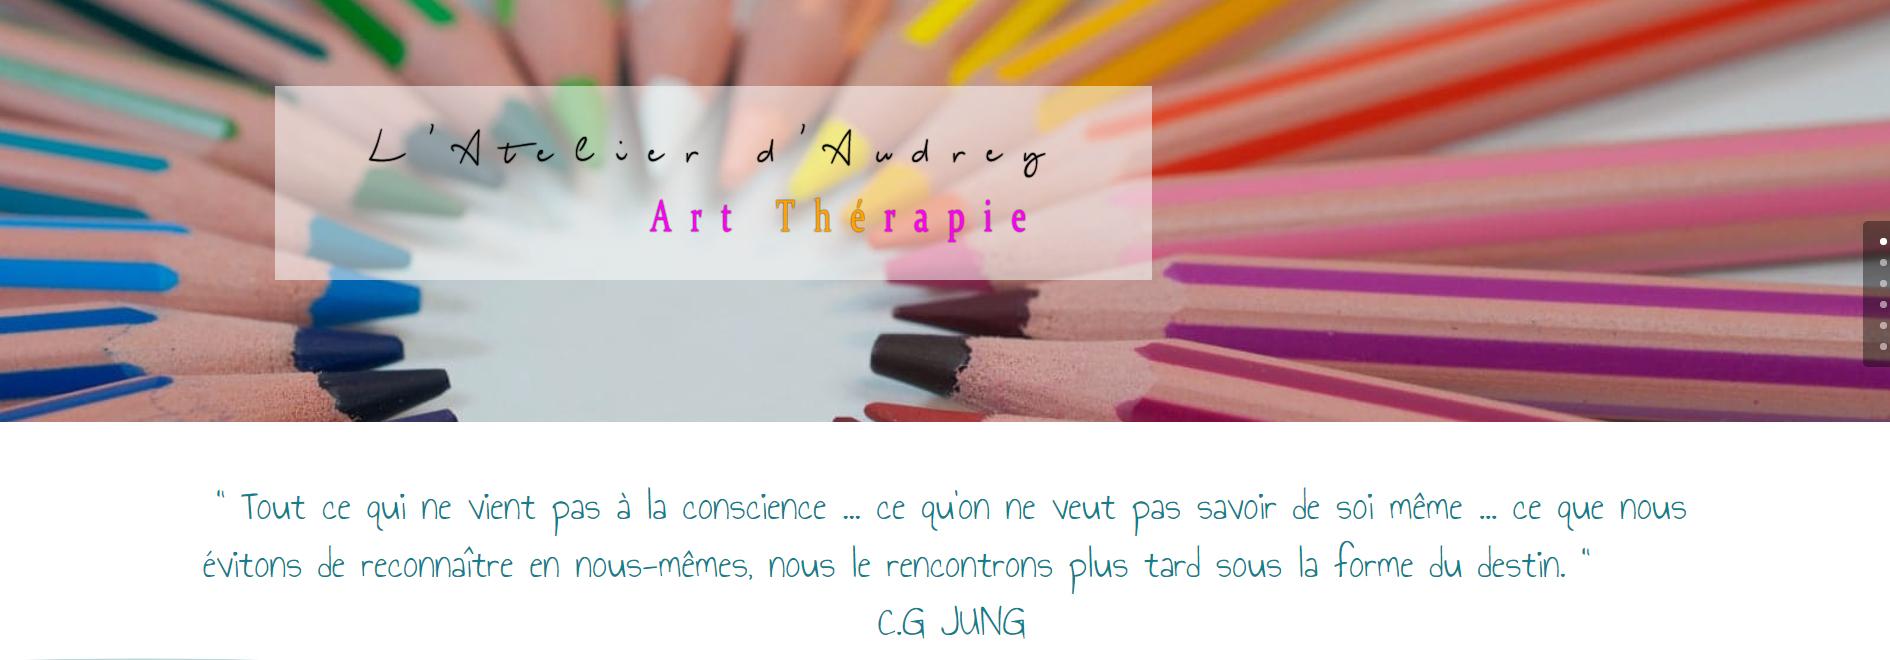 art therapie Audrey